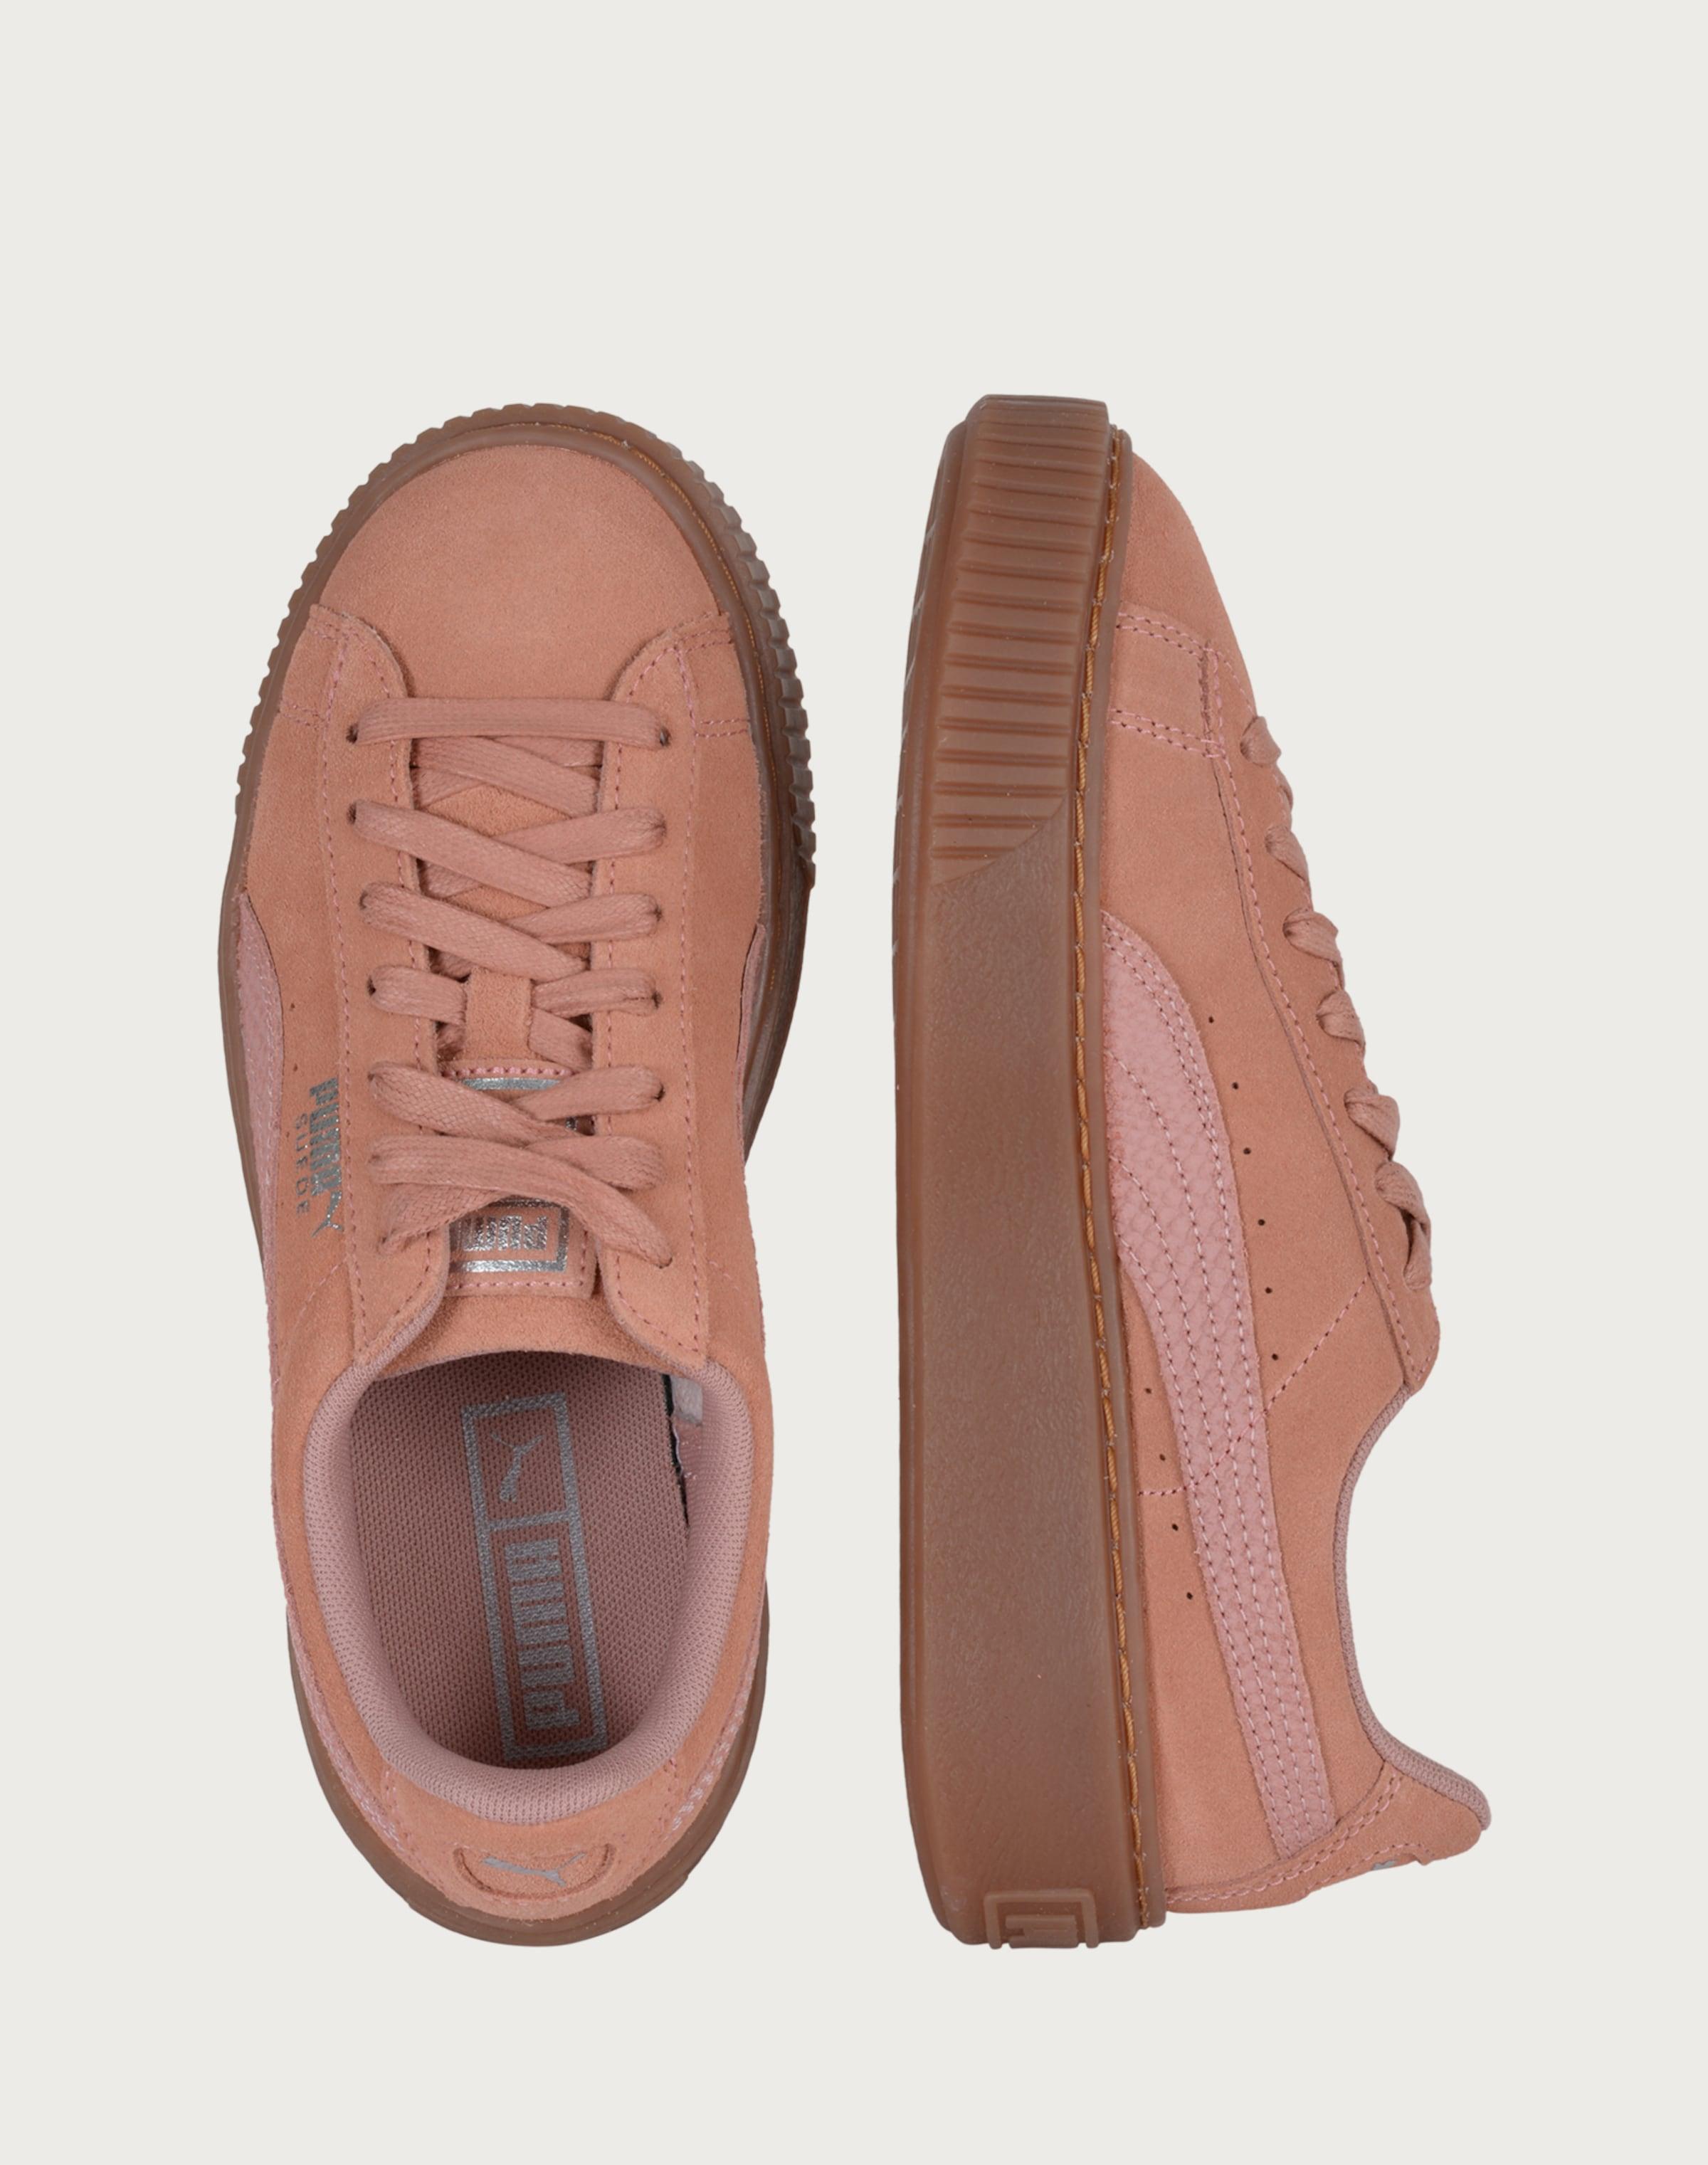 PUMA Platform-Sneakers 'Animal' Mode Günstig Online Original Zum Verkauf p7ccEuGa